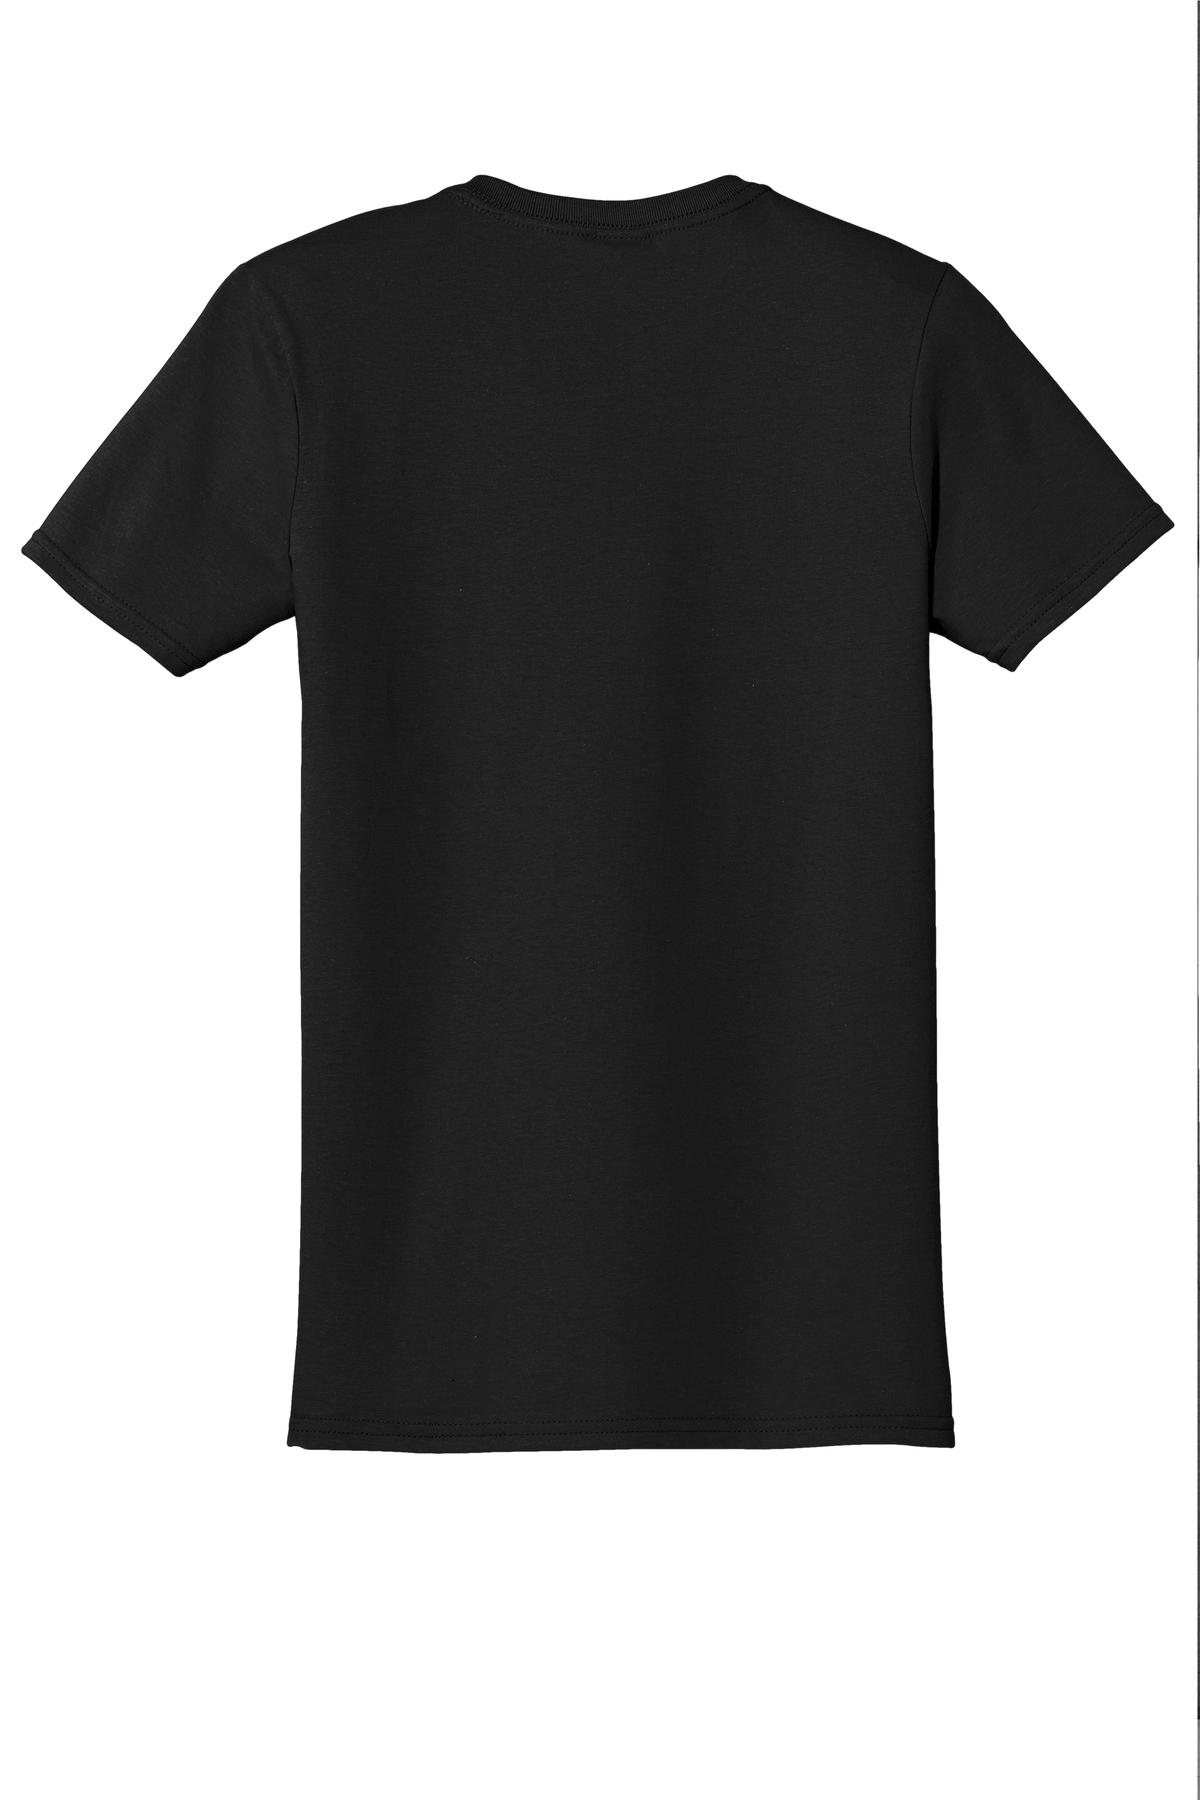 Gildan Softstyle® T-Shirt | 100% Cotton | T-Shirts | SanMar